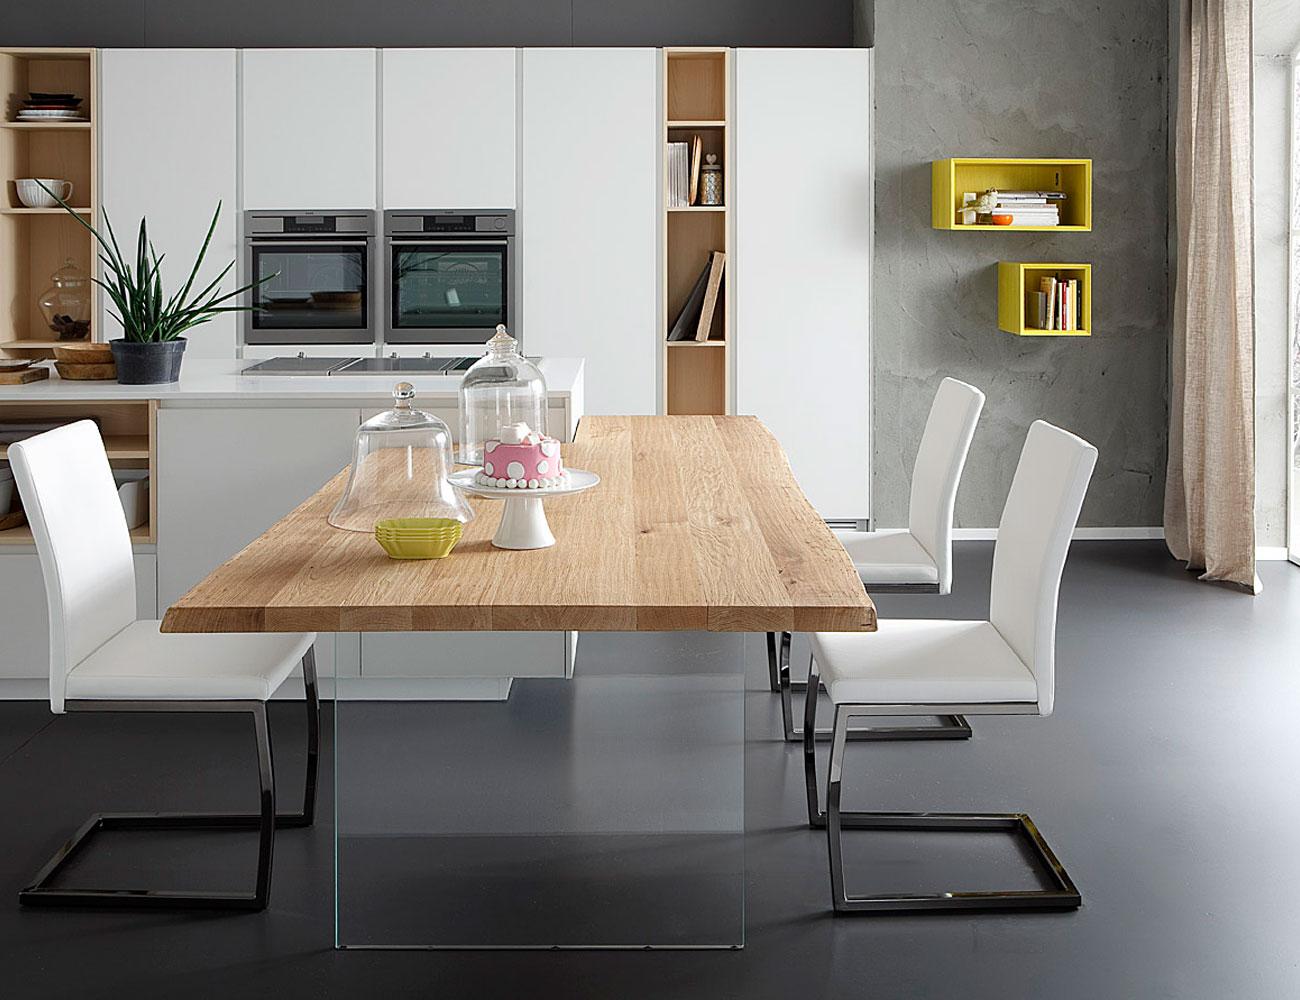 Lambri arredamenti vendita mobili classici di design e for Arredamenti piacenza